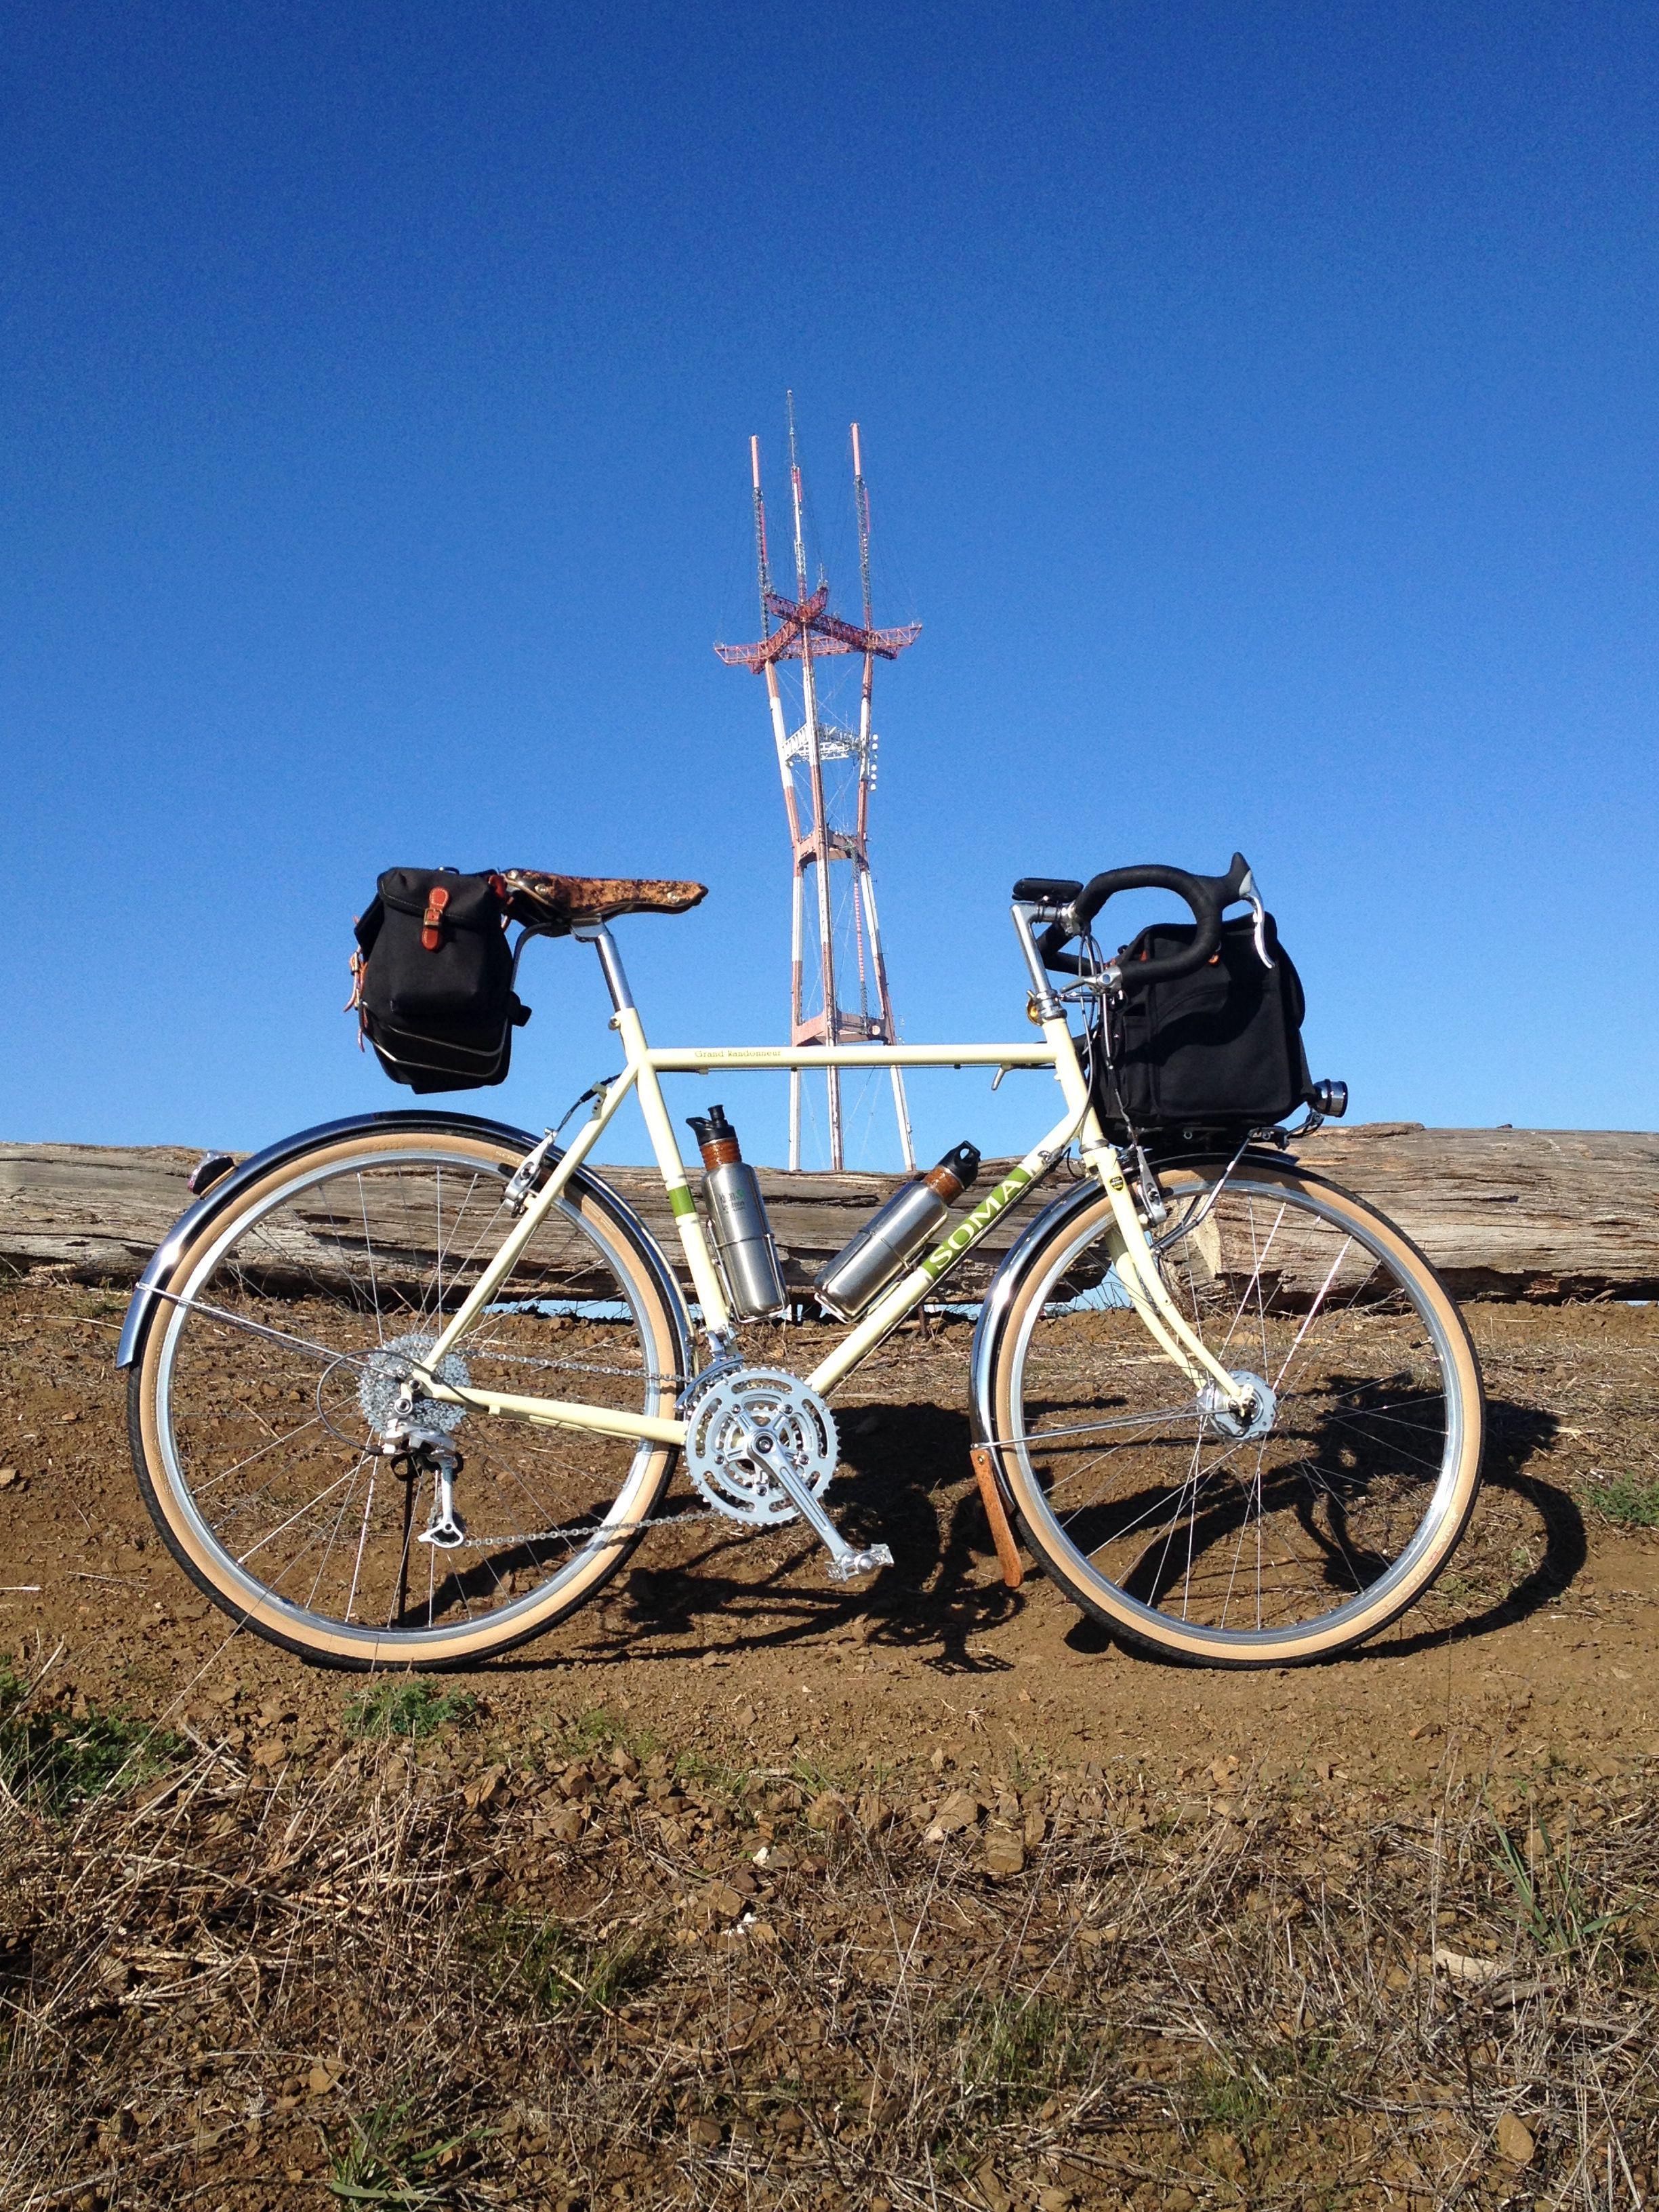 Soma Grand Randonneur 650b Brevet Bike | BICYCLE LIFE ...